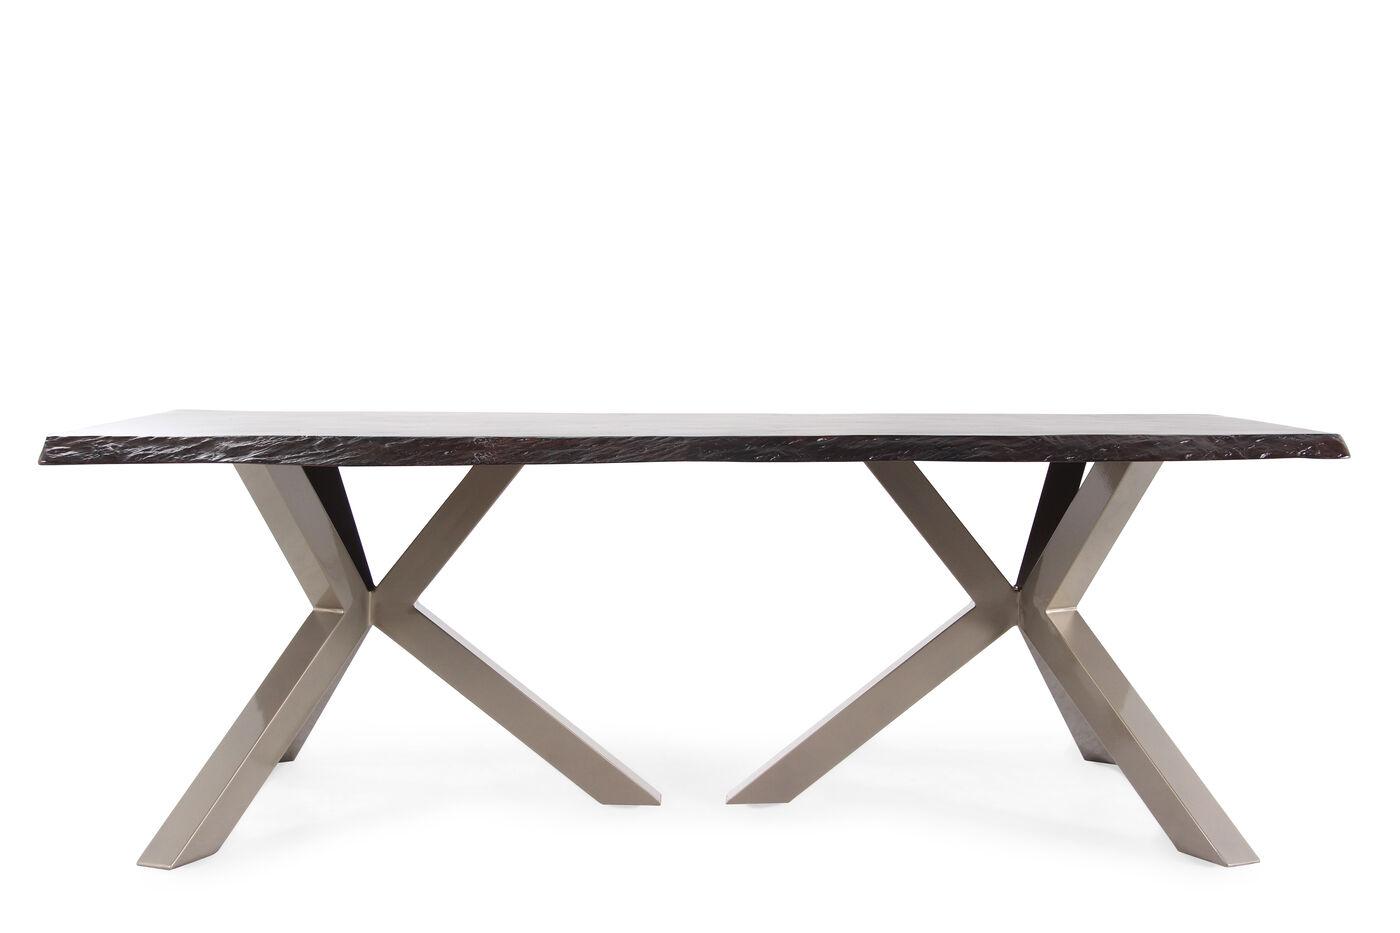 Images Tripod Pedestal Aluminum Rectangular Dining Tablenbspin Dark Brown